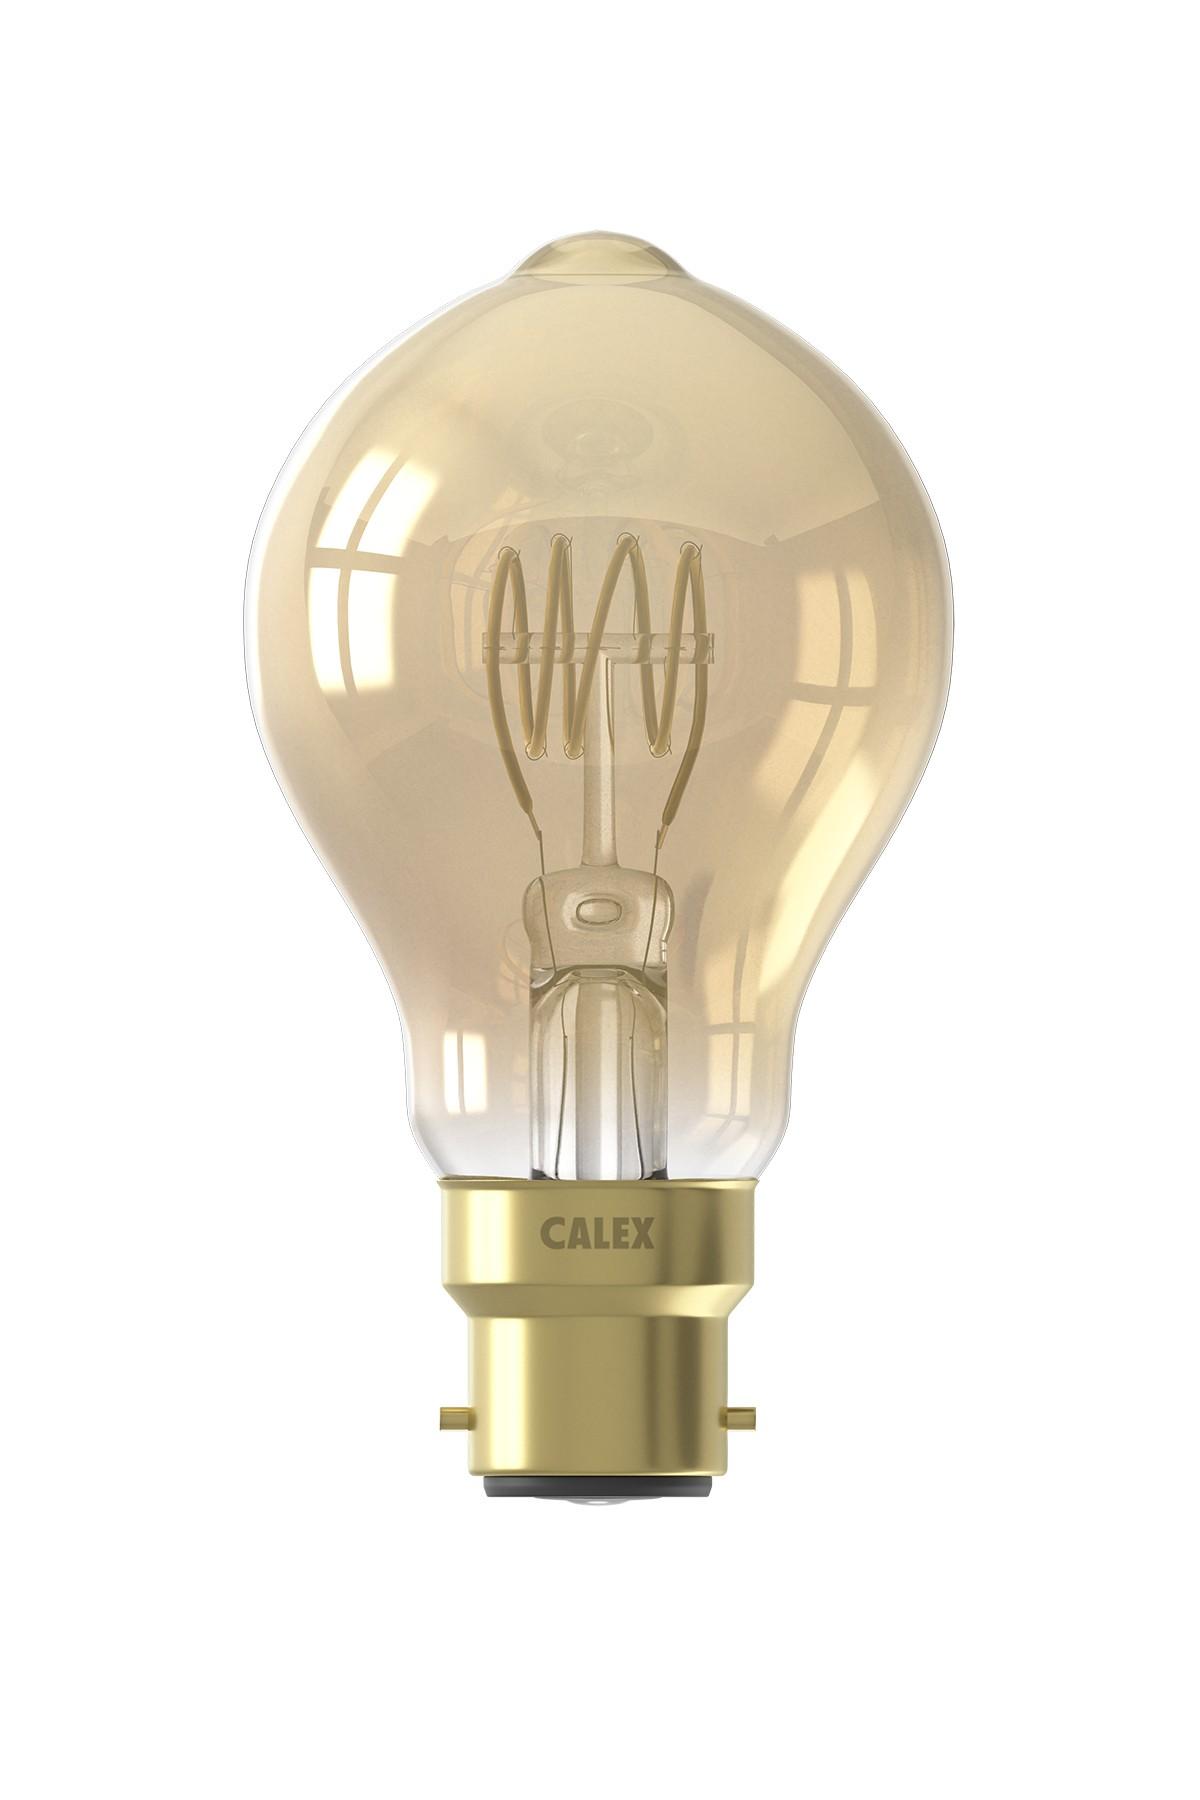 Calex LED volglas Flex Filament Standaardlamp 220-240V 4W 200lm B22 A60DR, Goud 2100K Dimbaar